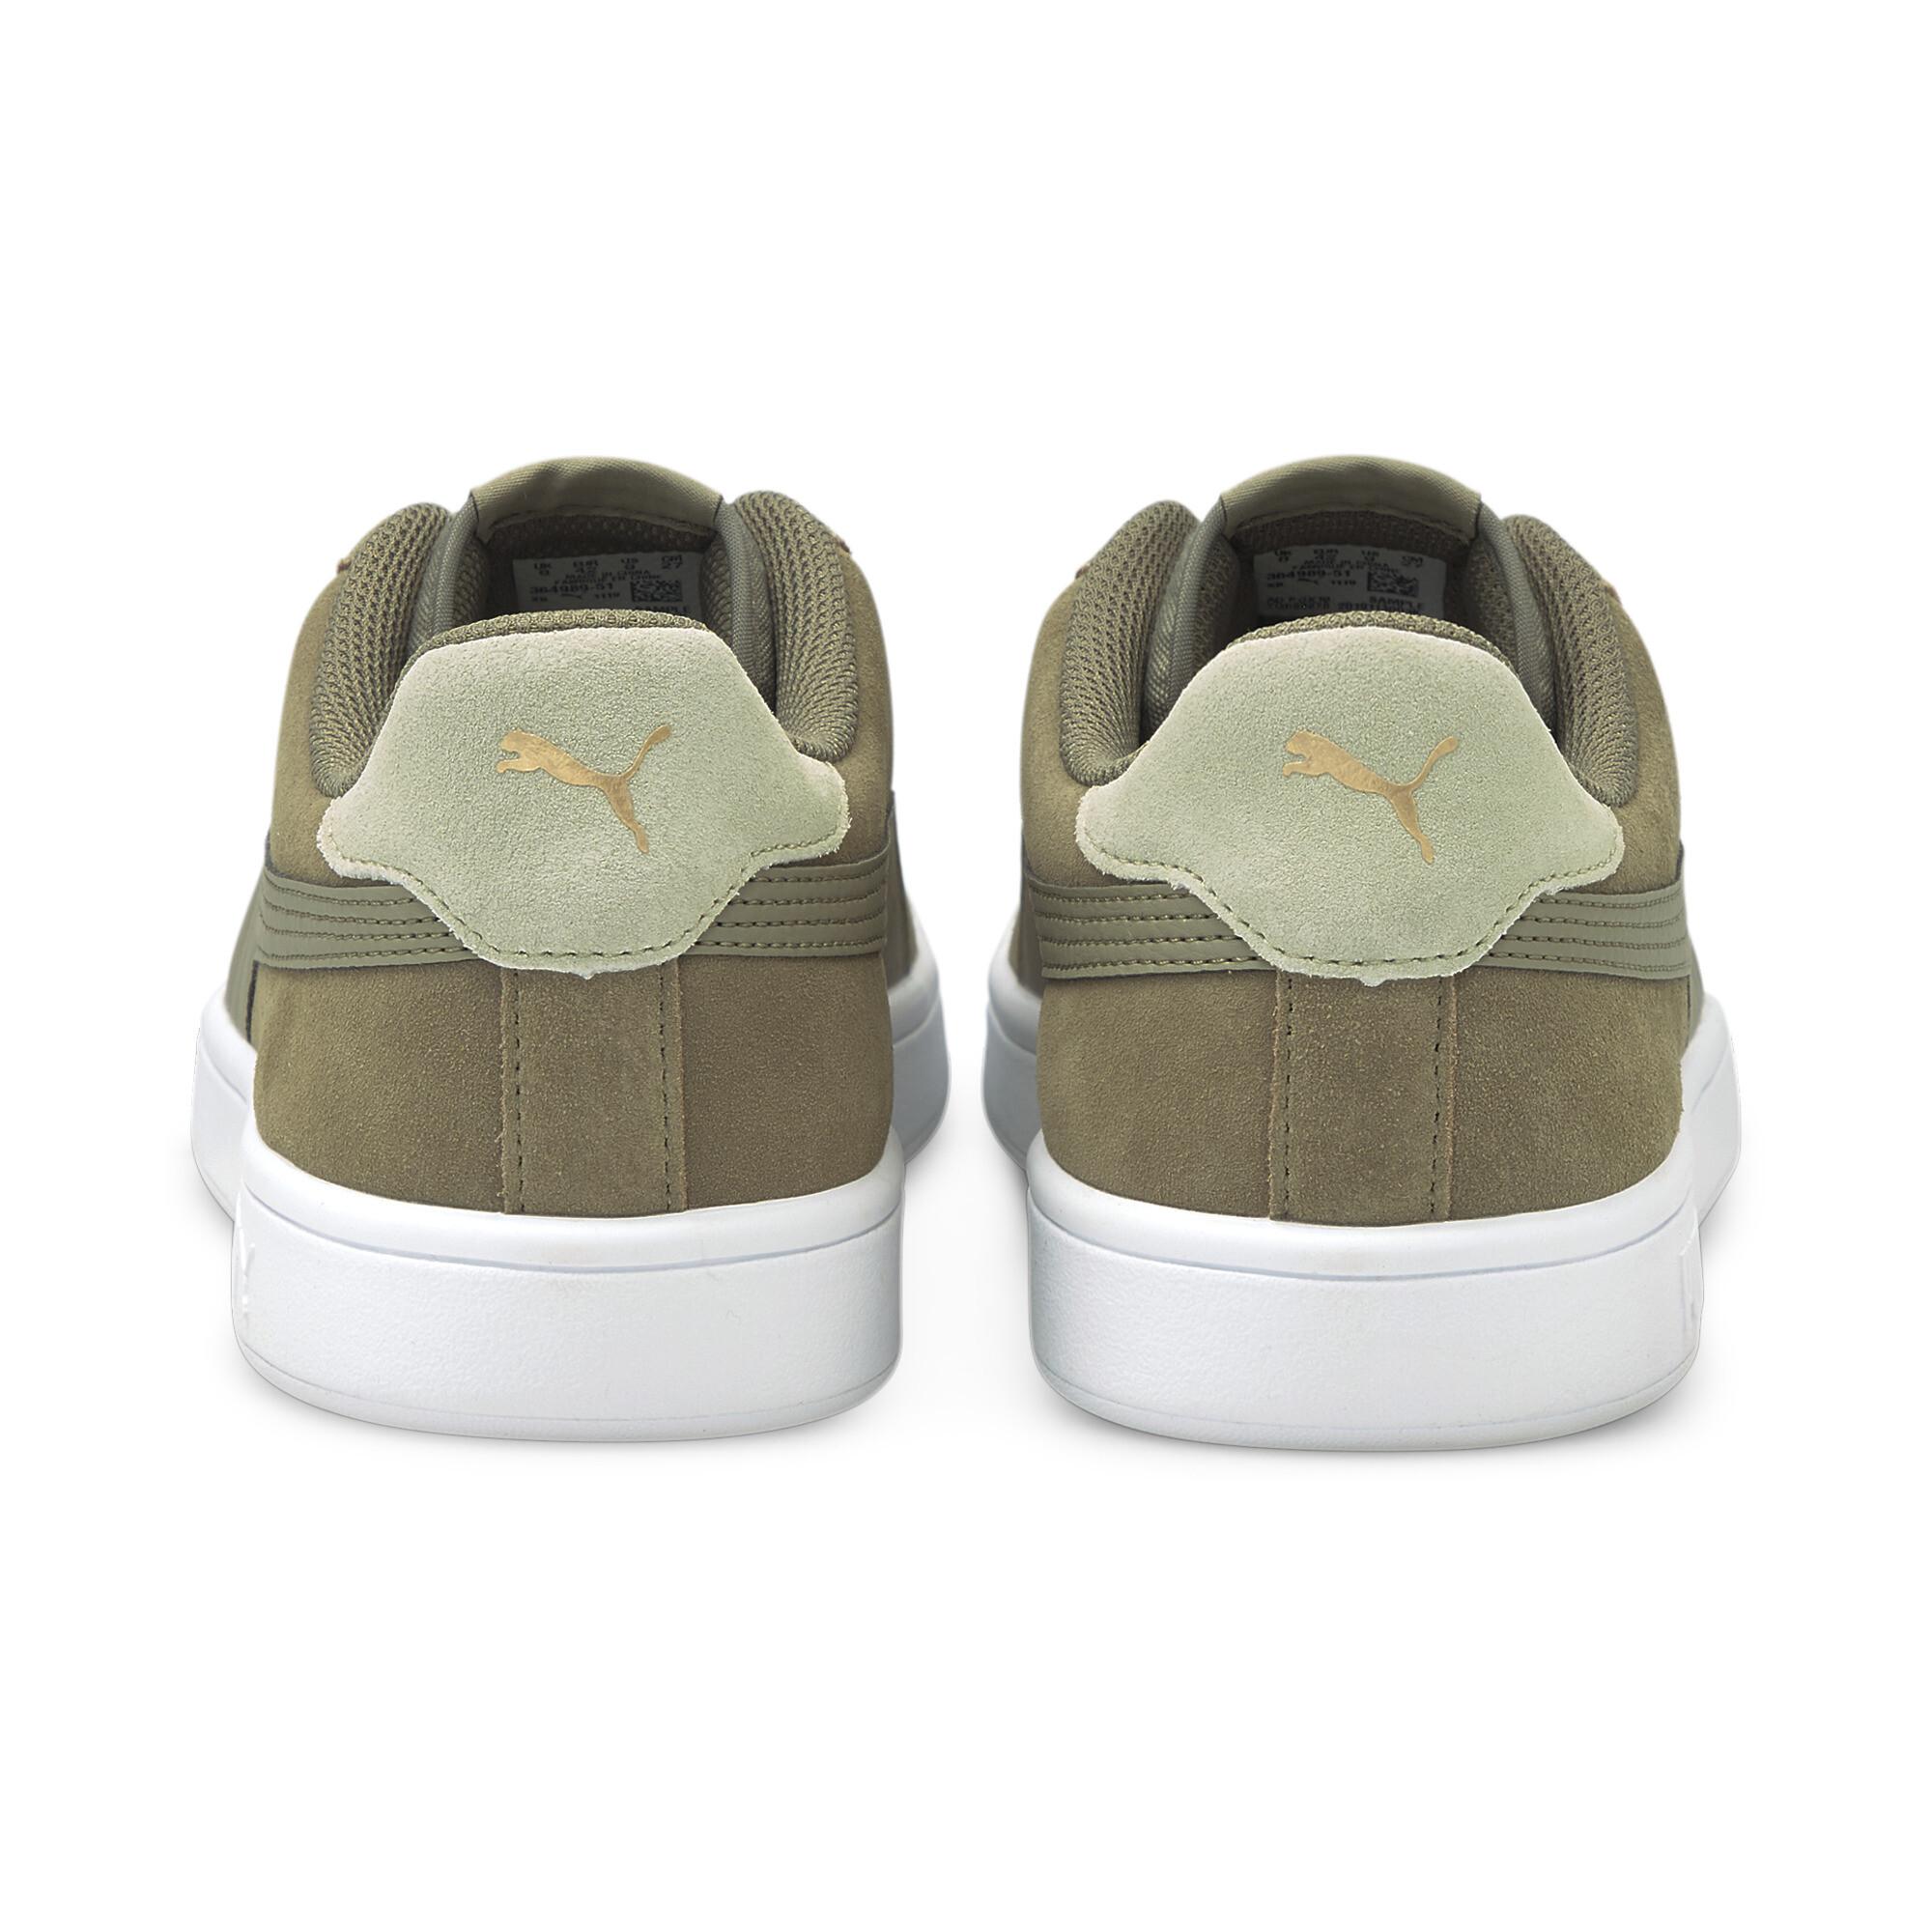 miniature 15 - Puma Men's Smash v2 Sneakers